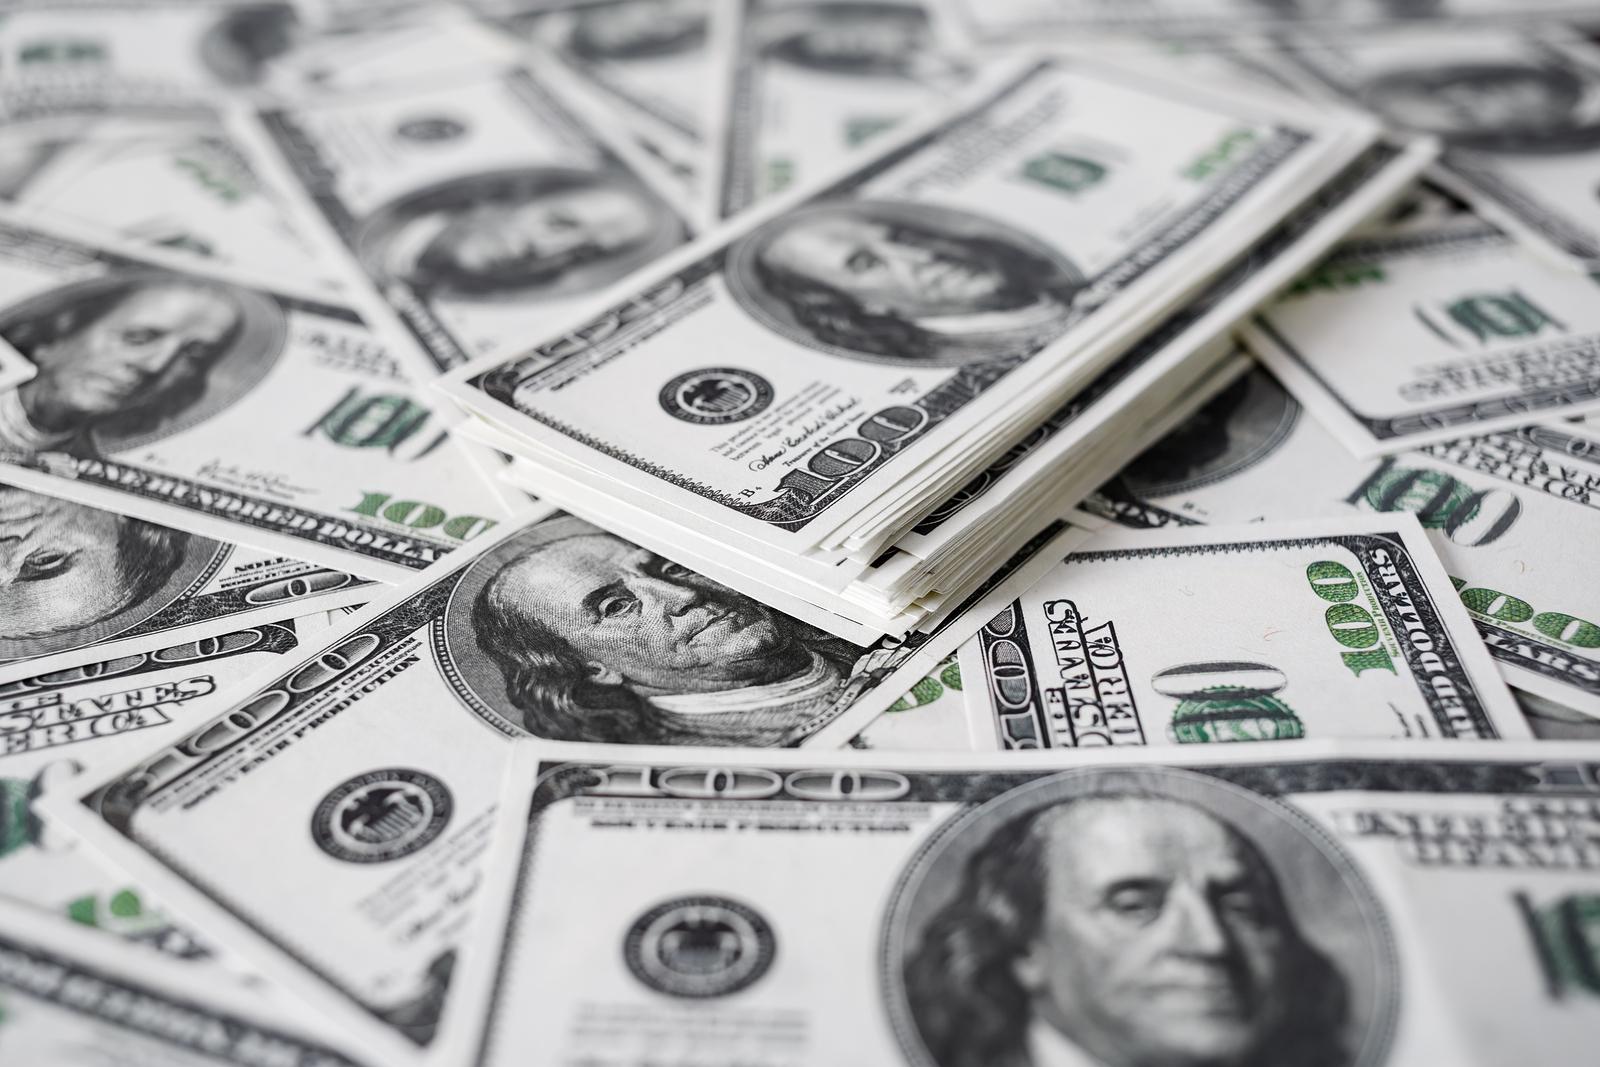 Inversión extranjera directa en México aumenta 11% en 2017